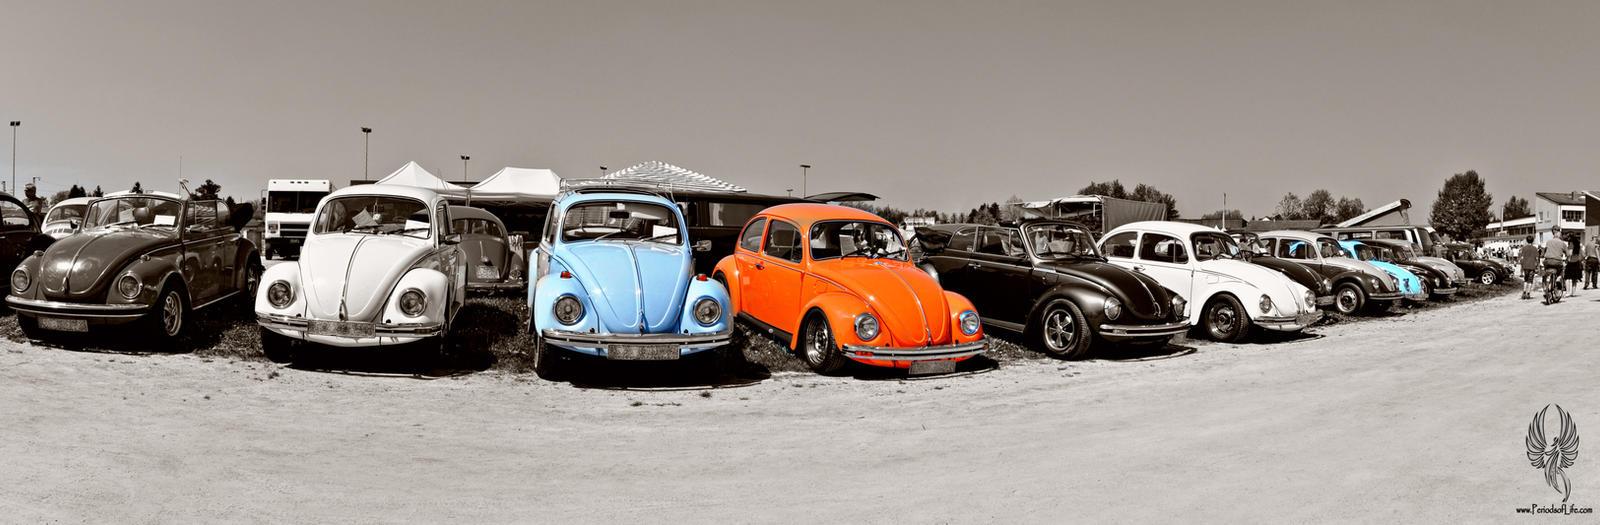 beetle04 by PeriodsofLife